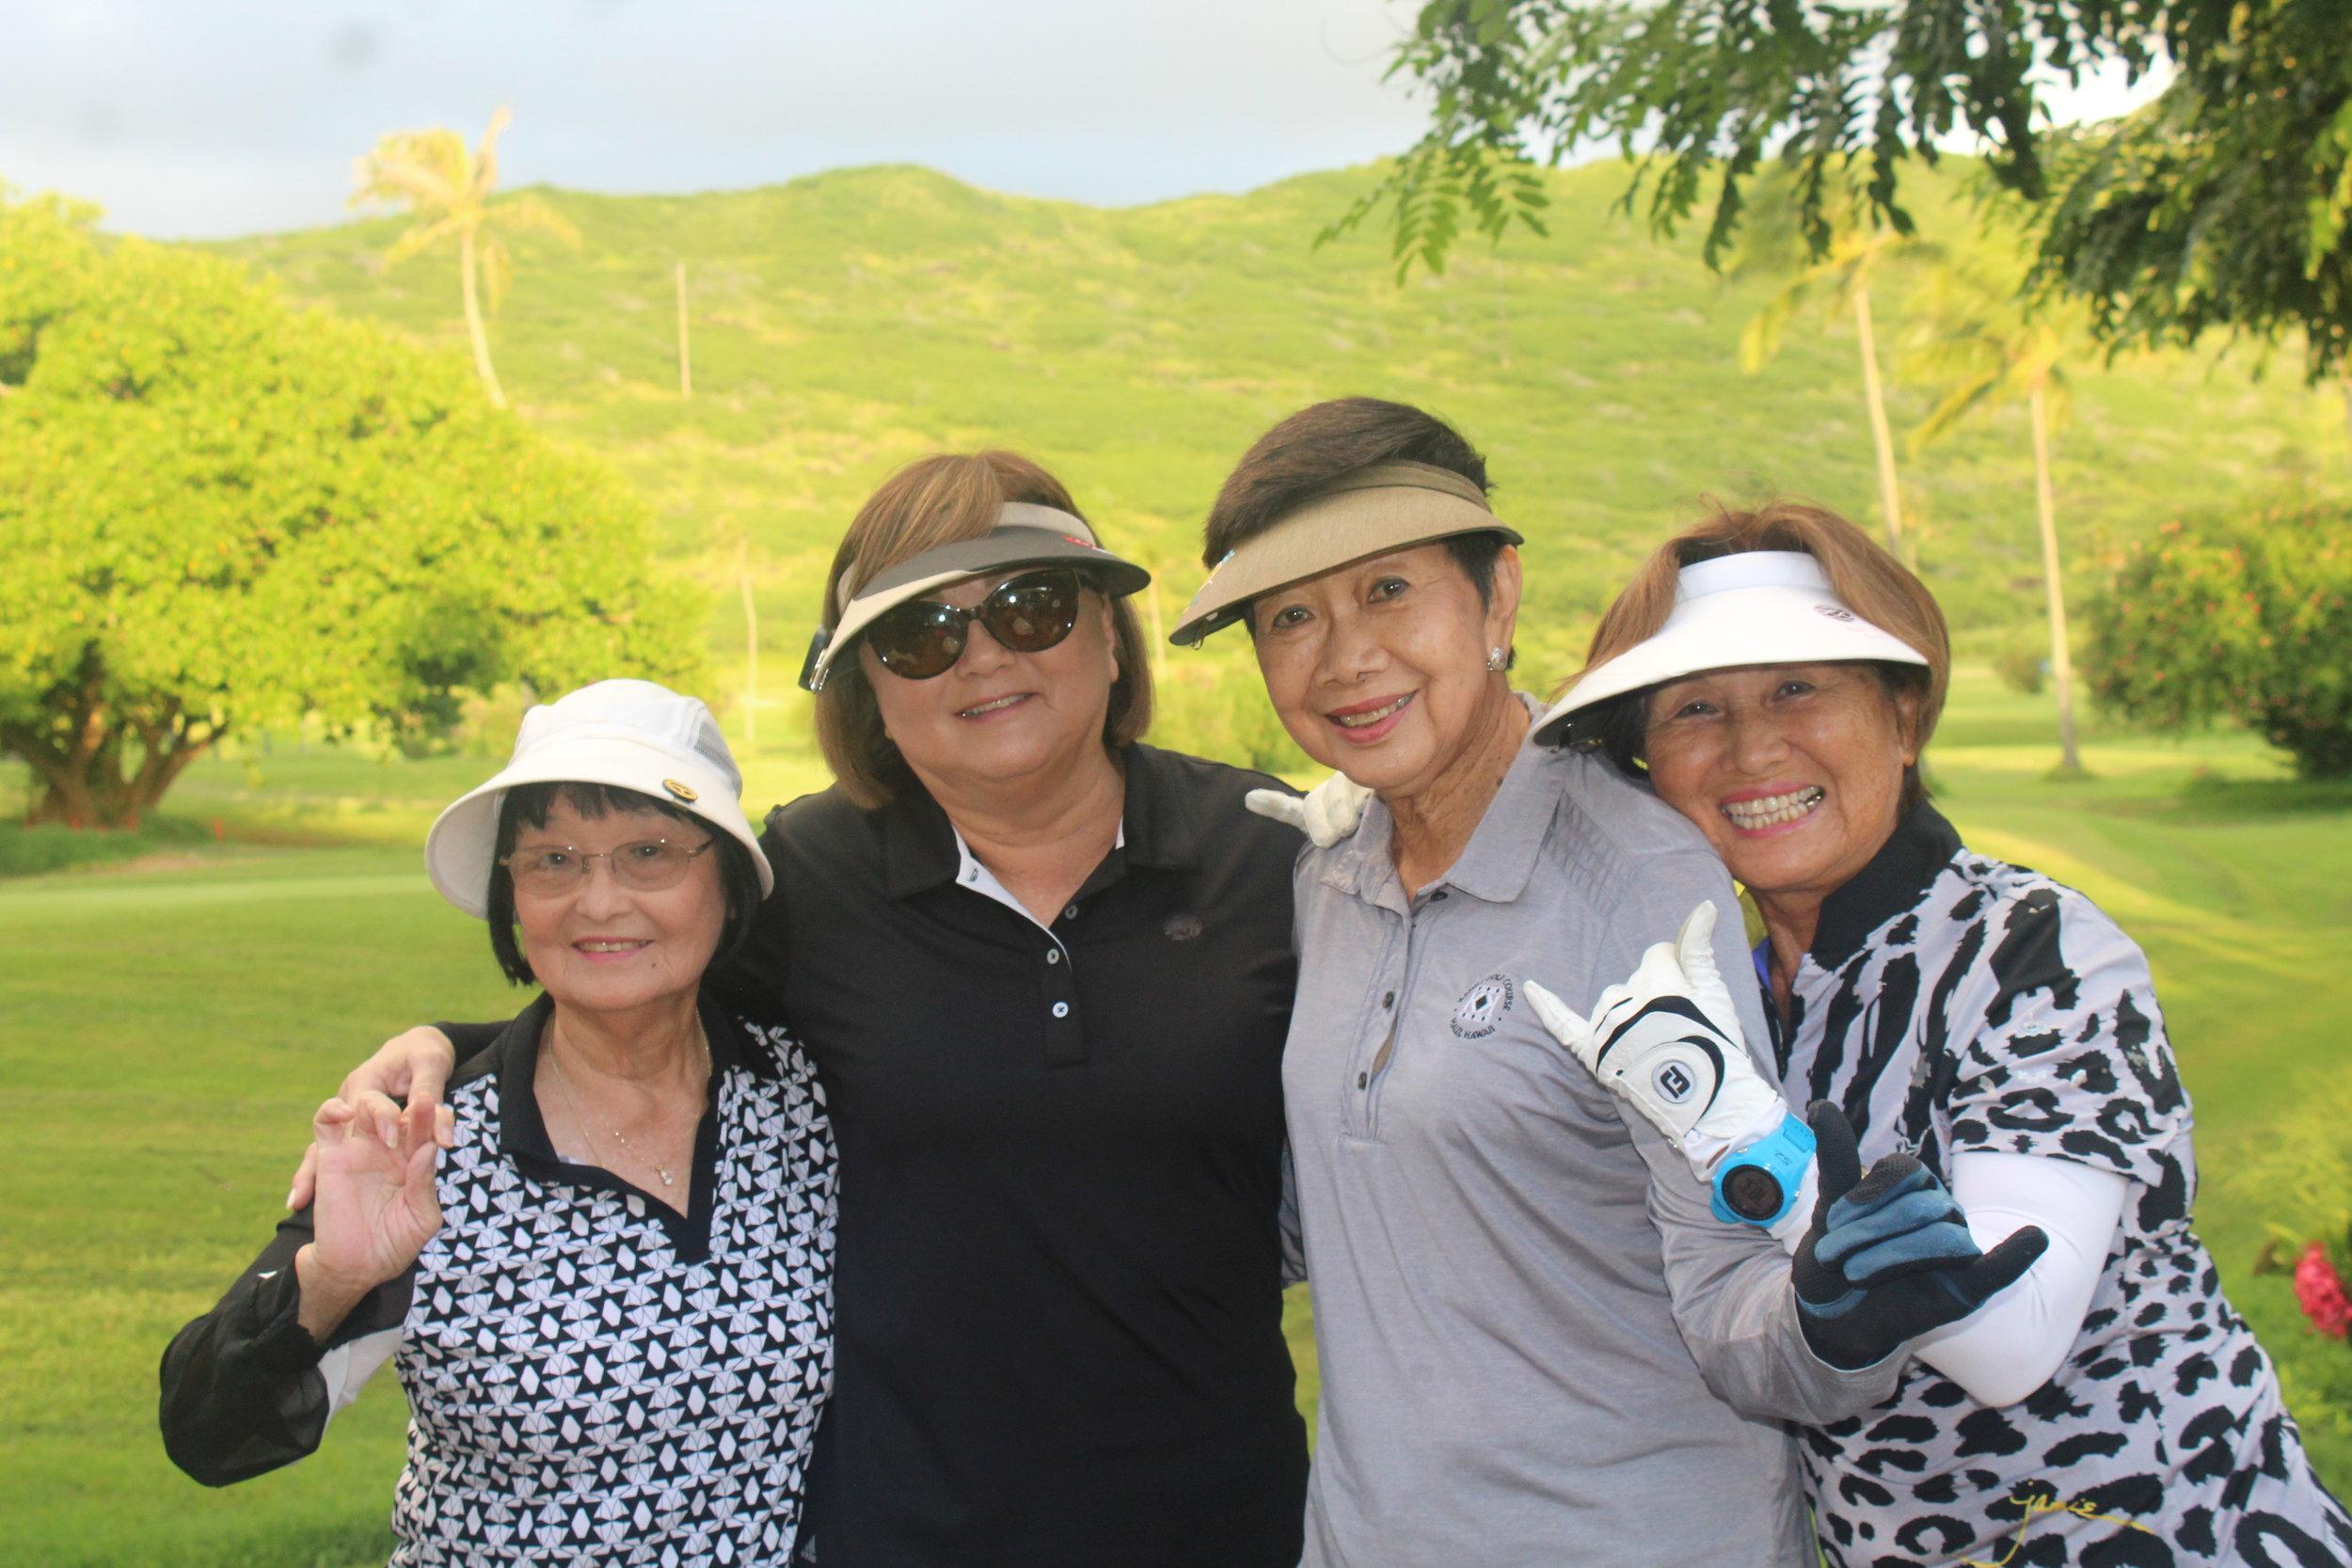 Carol Ching's Team